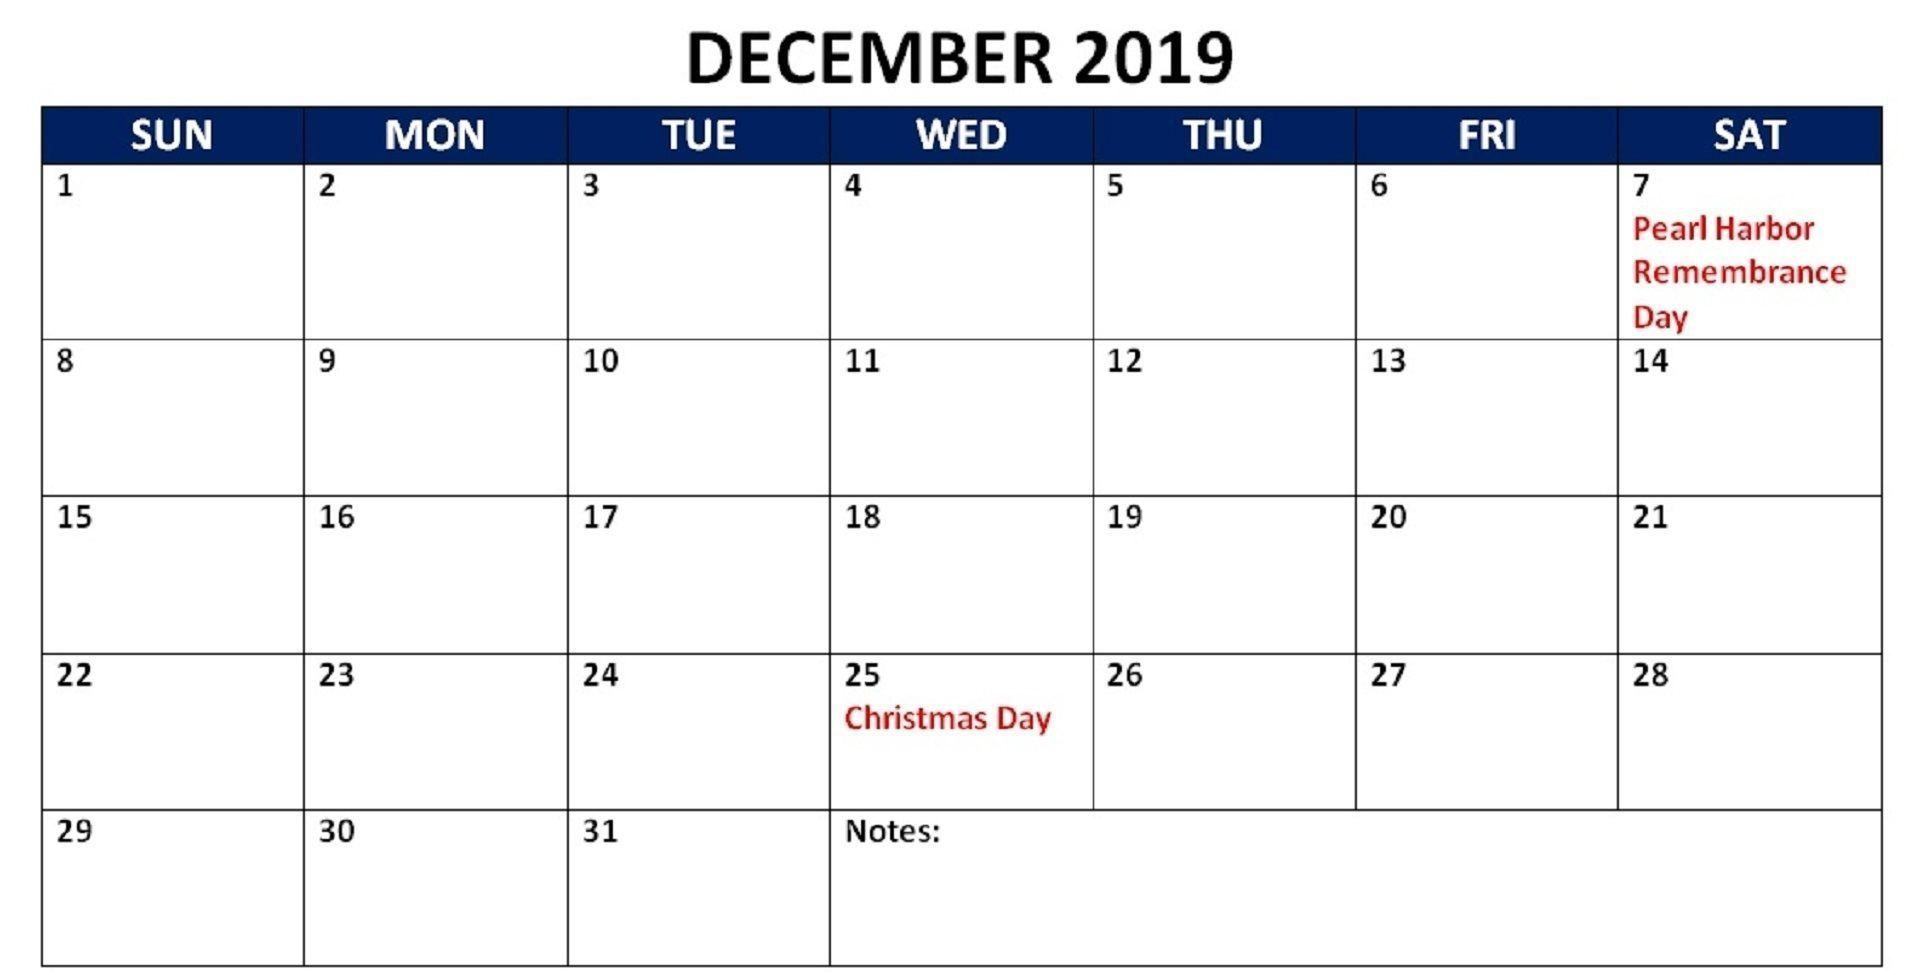 December 2019 Calendar With Holidays Uk Printable Free Calendar